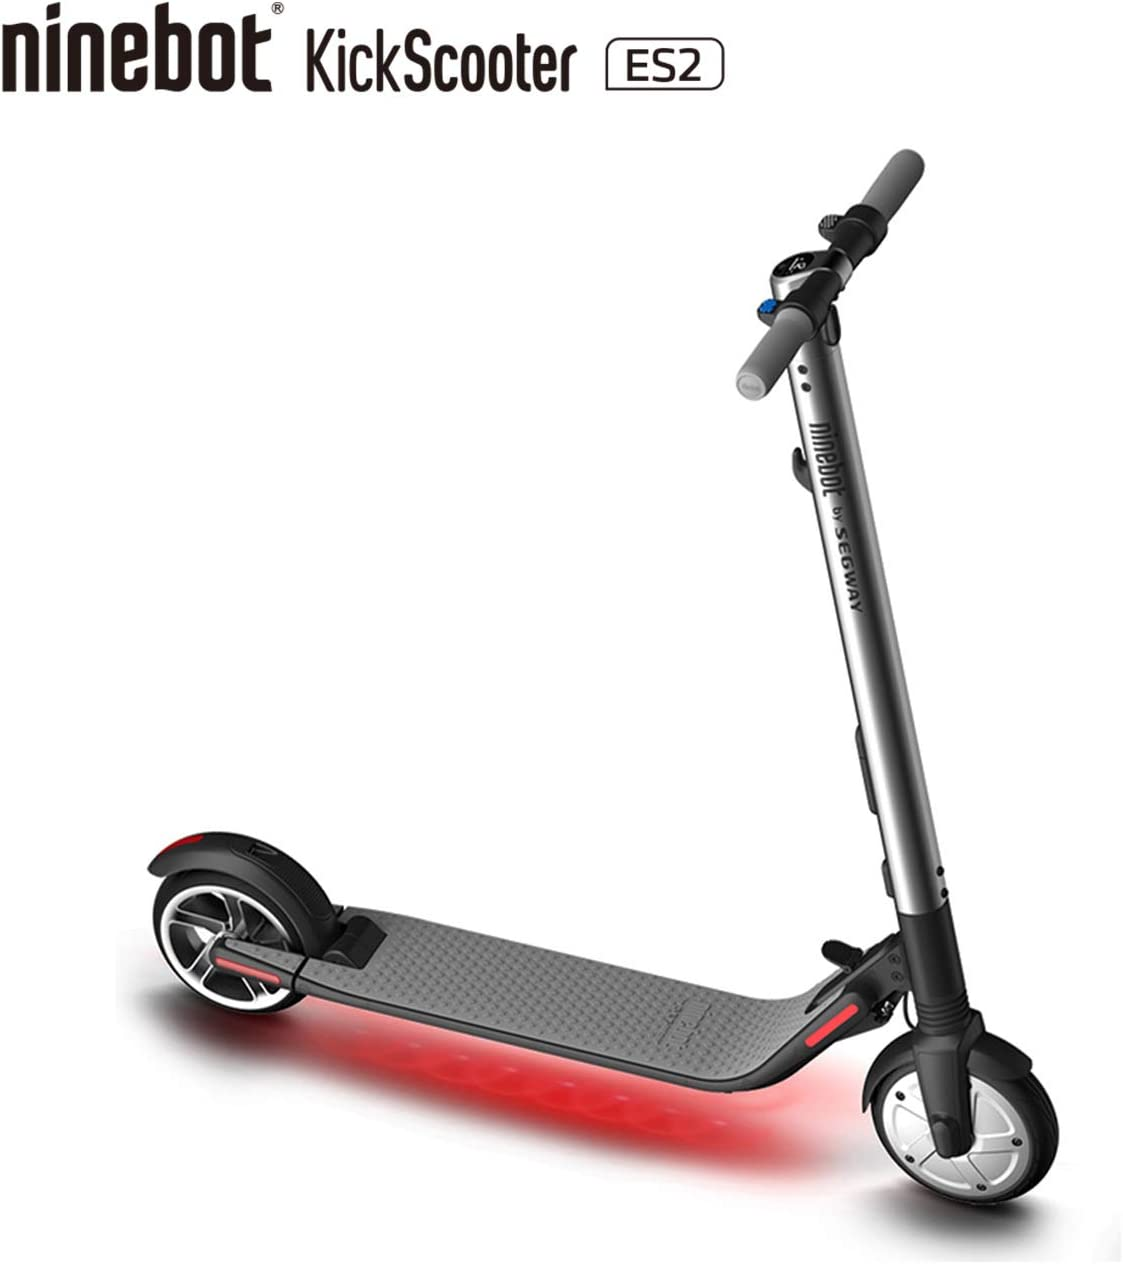 Segway Ninebot ES2 Kickscooter Review